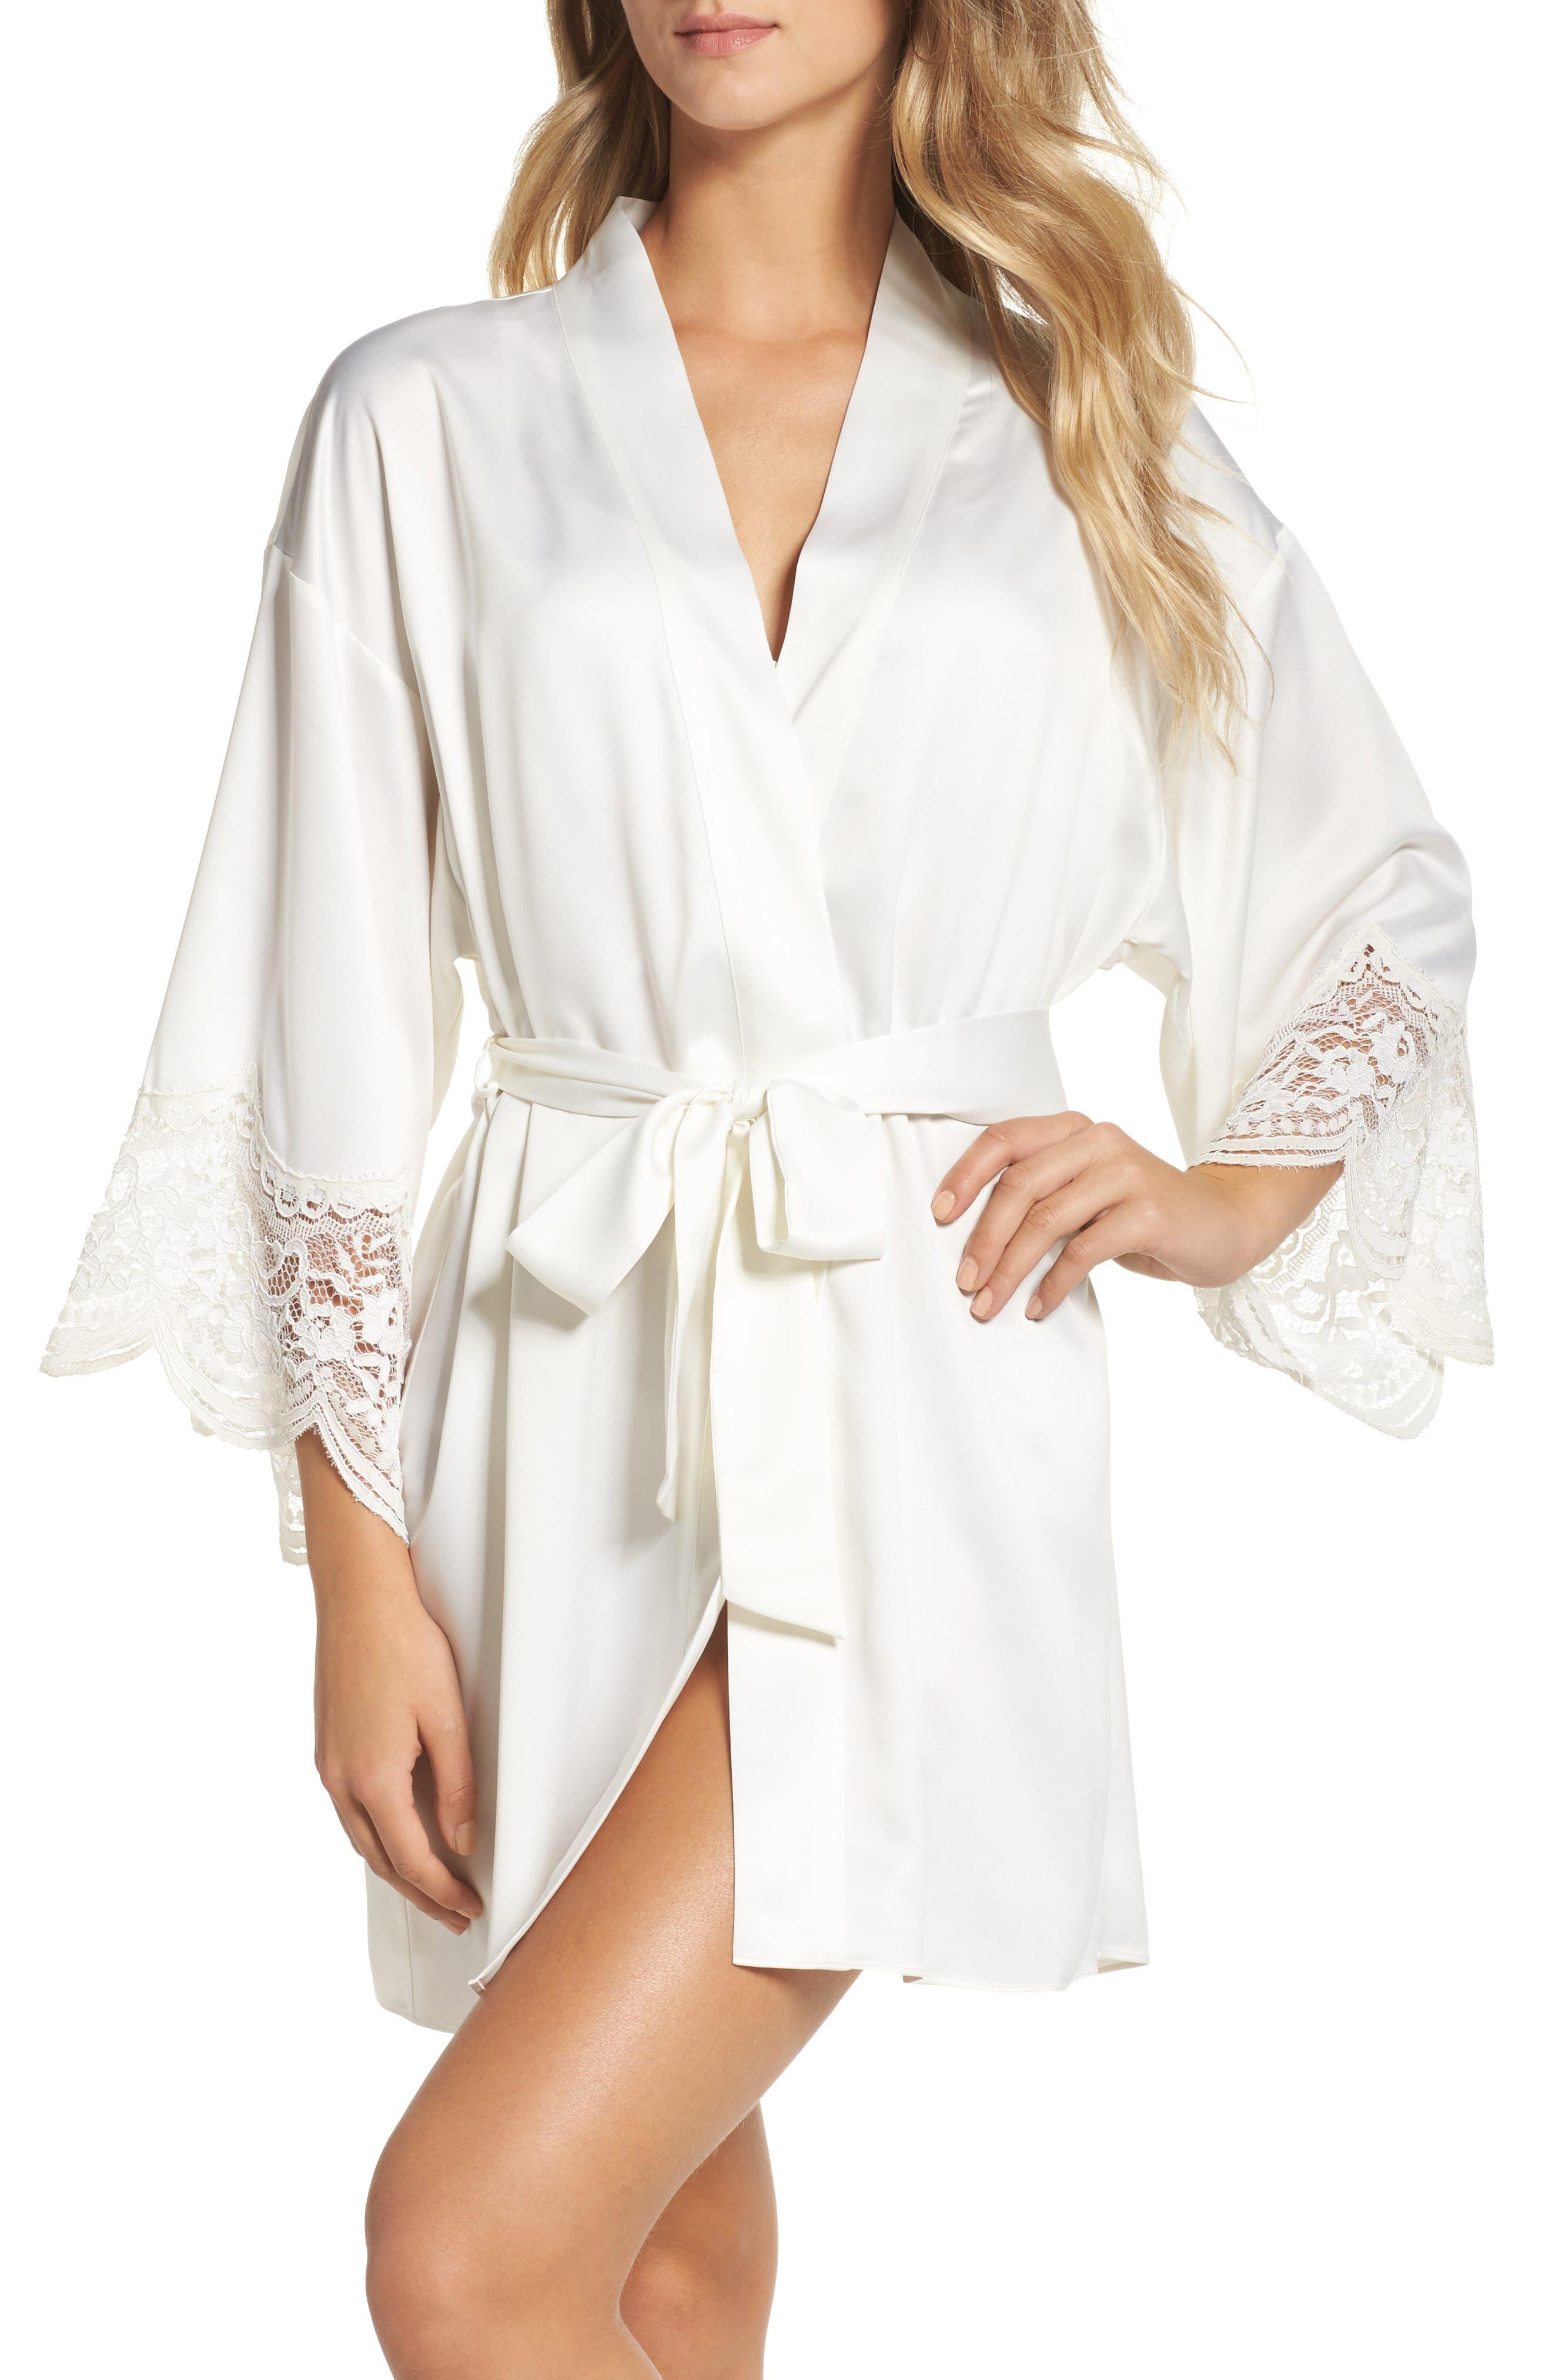 Monica Satin Kimono Robe,                             Main thumbnail 1, color,                             900